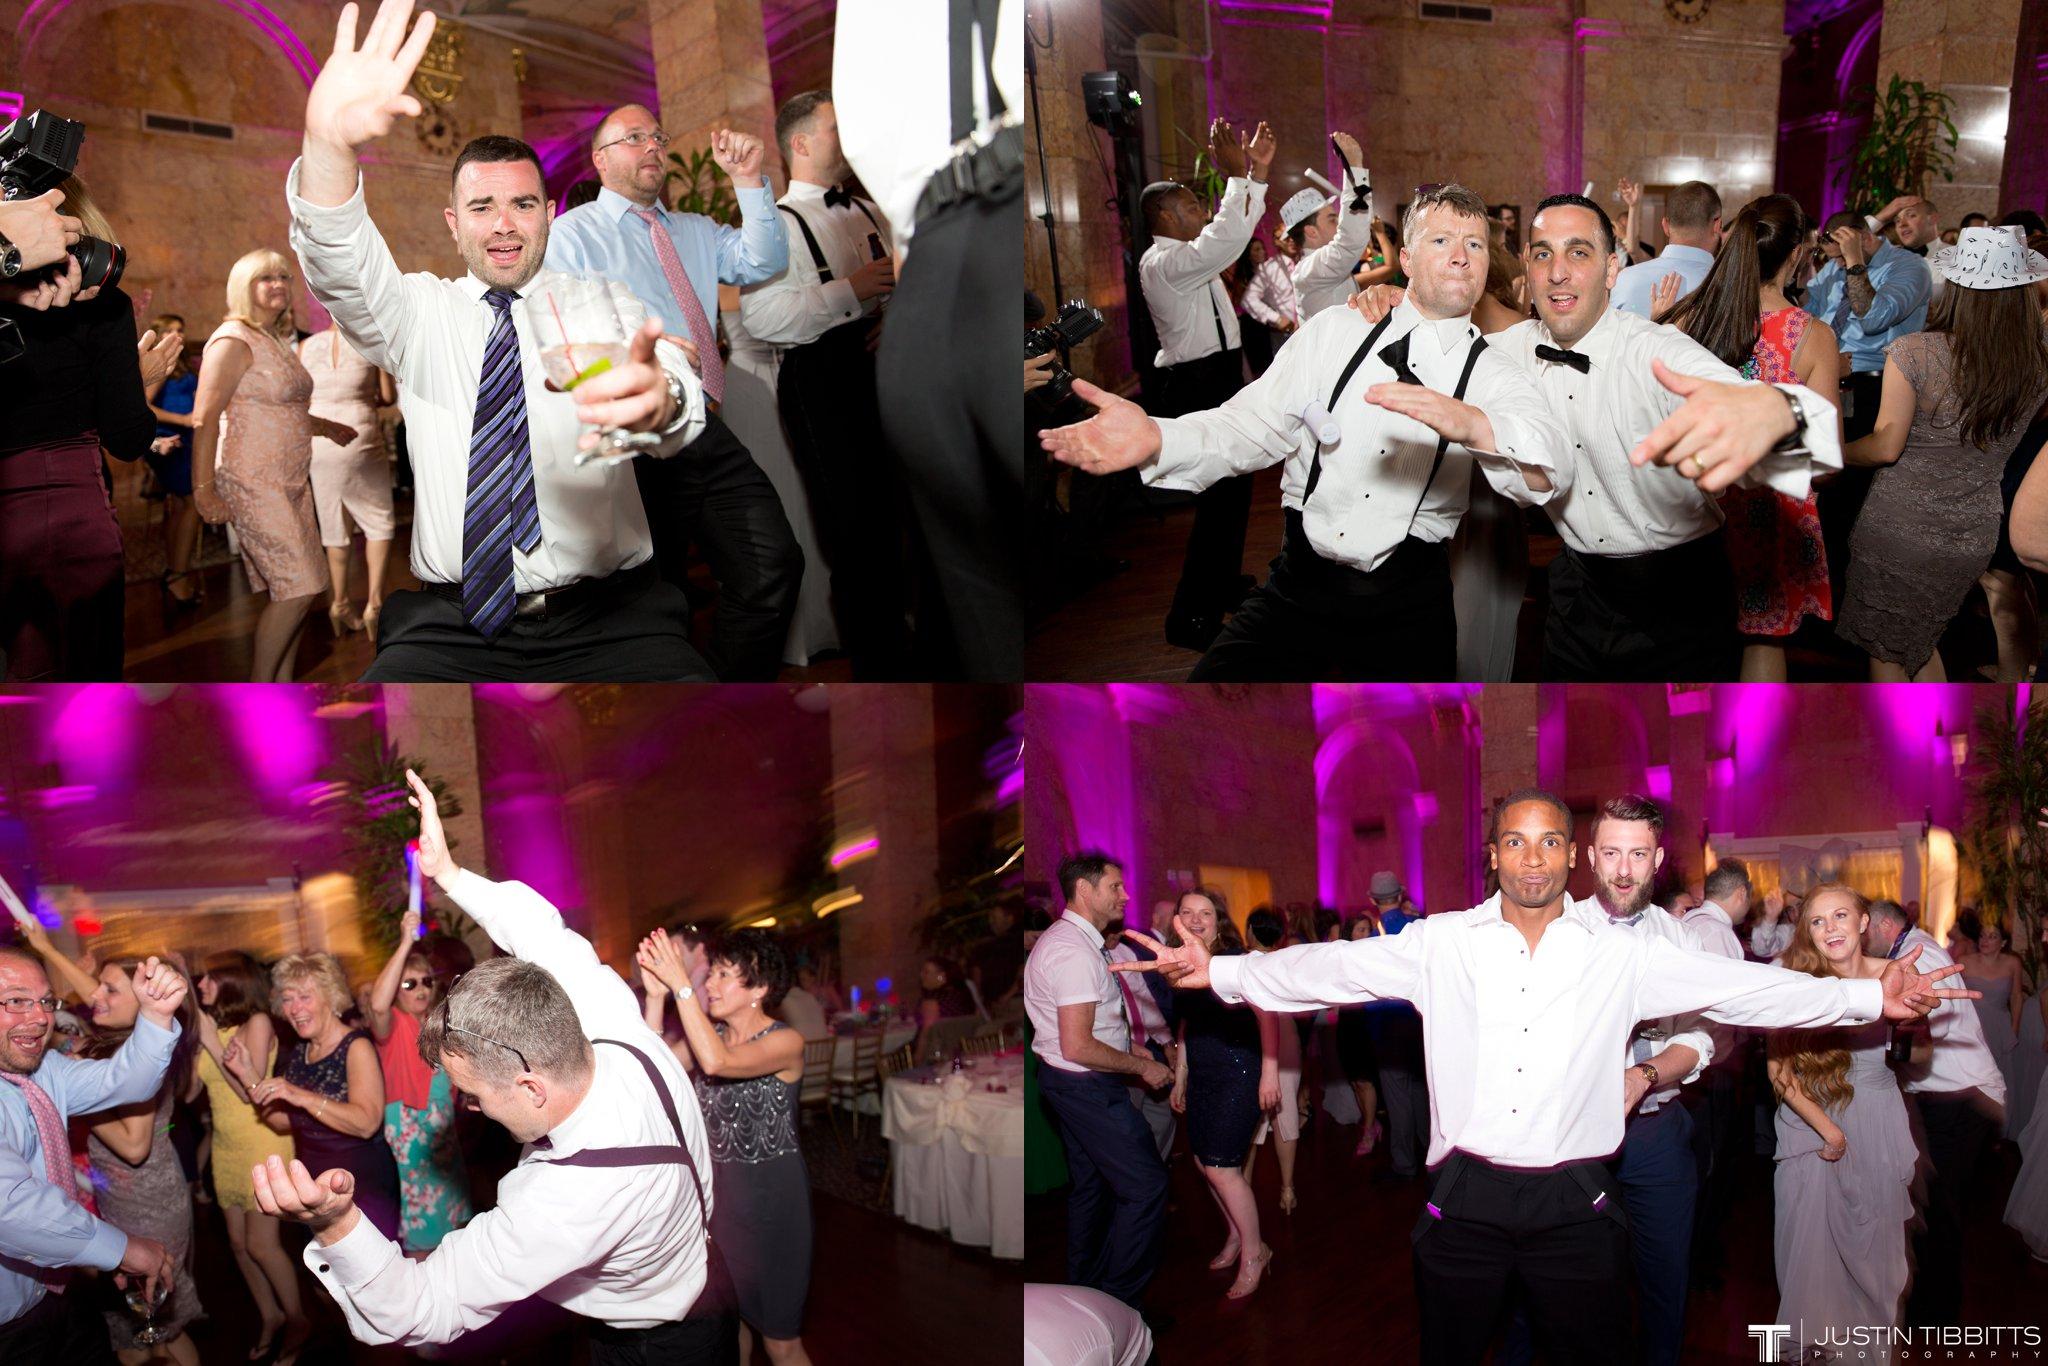 state-room-wedding-photos-with-amanda-and-nick_0177